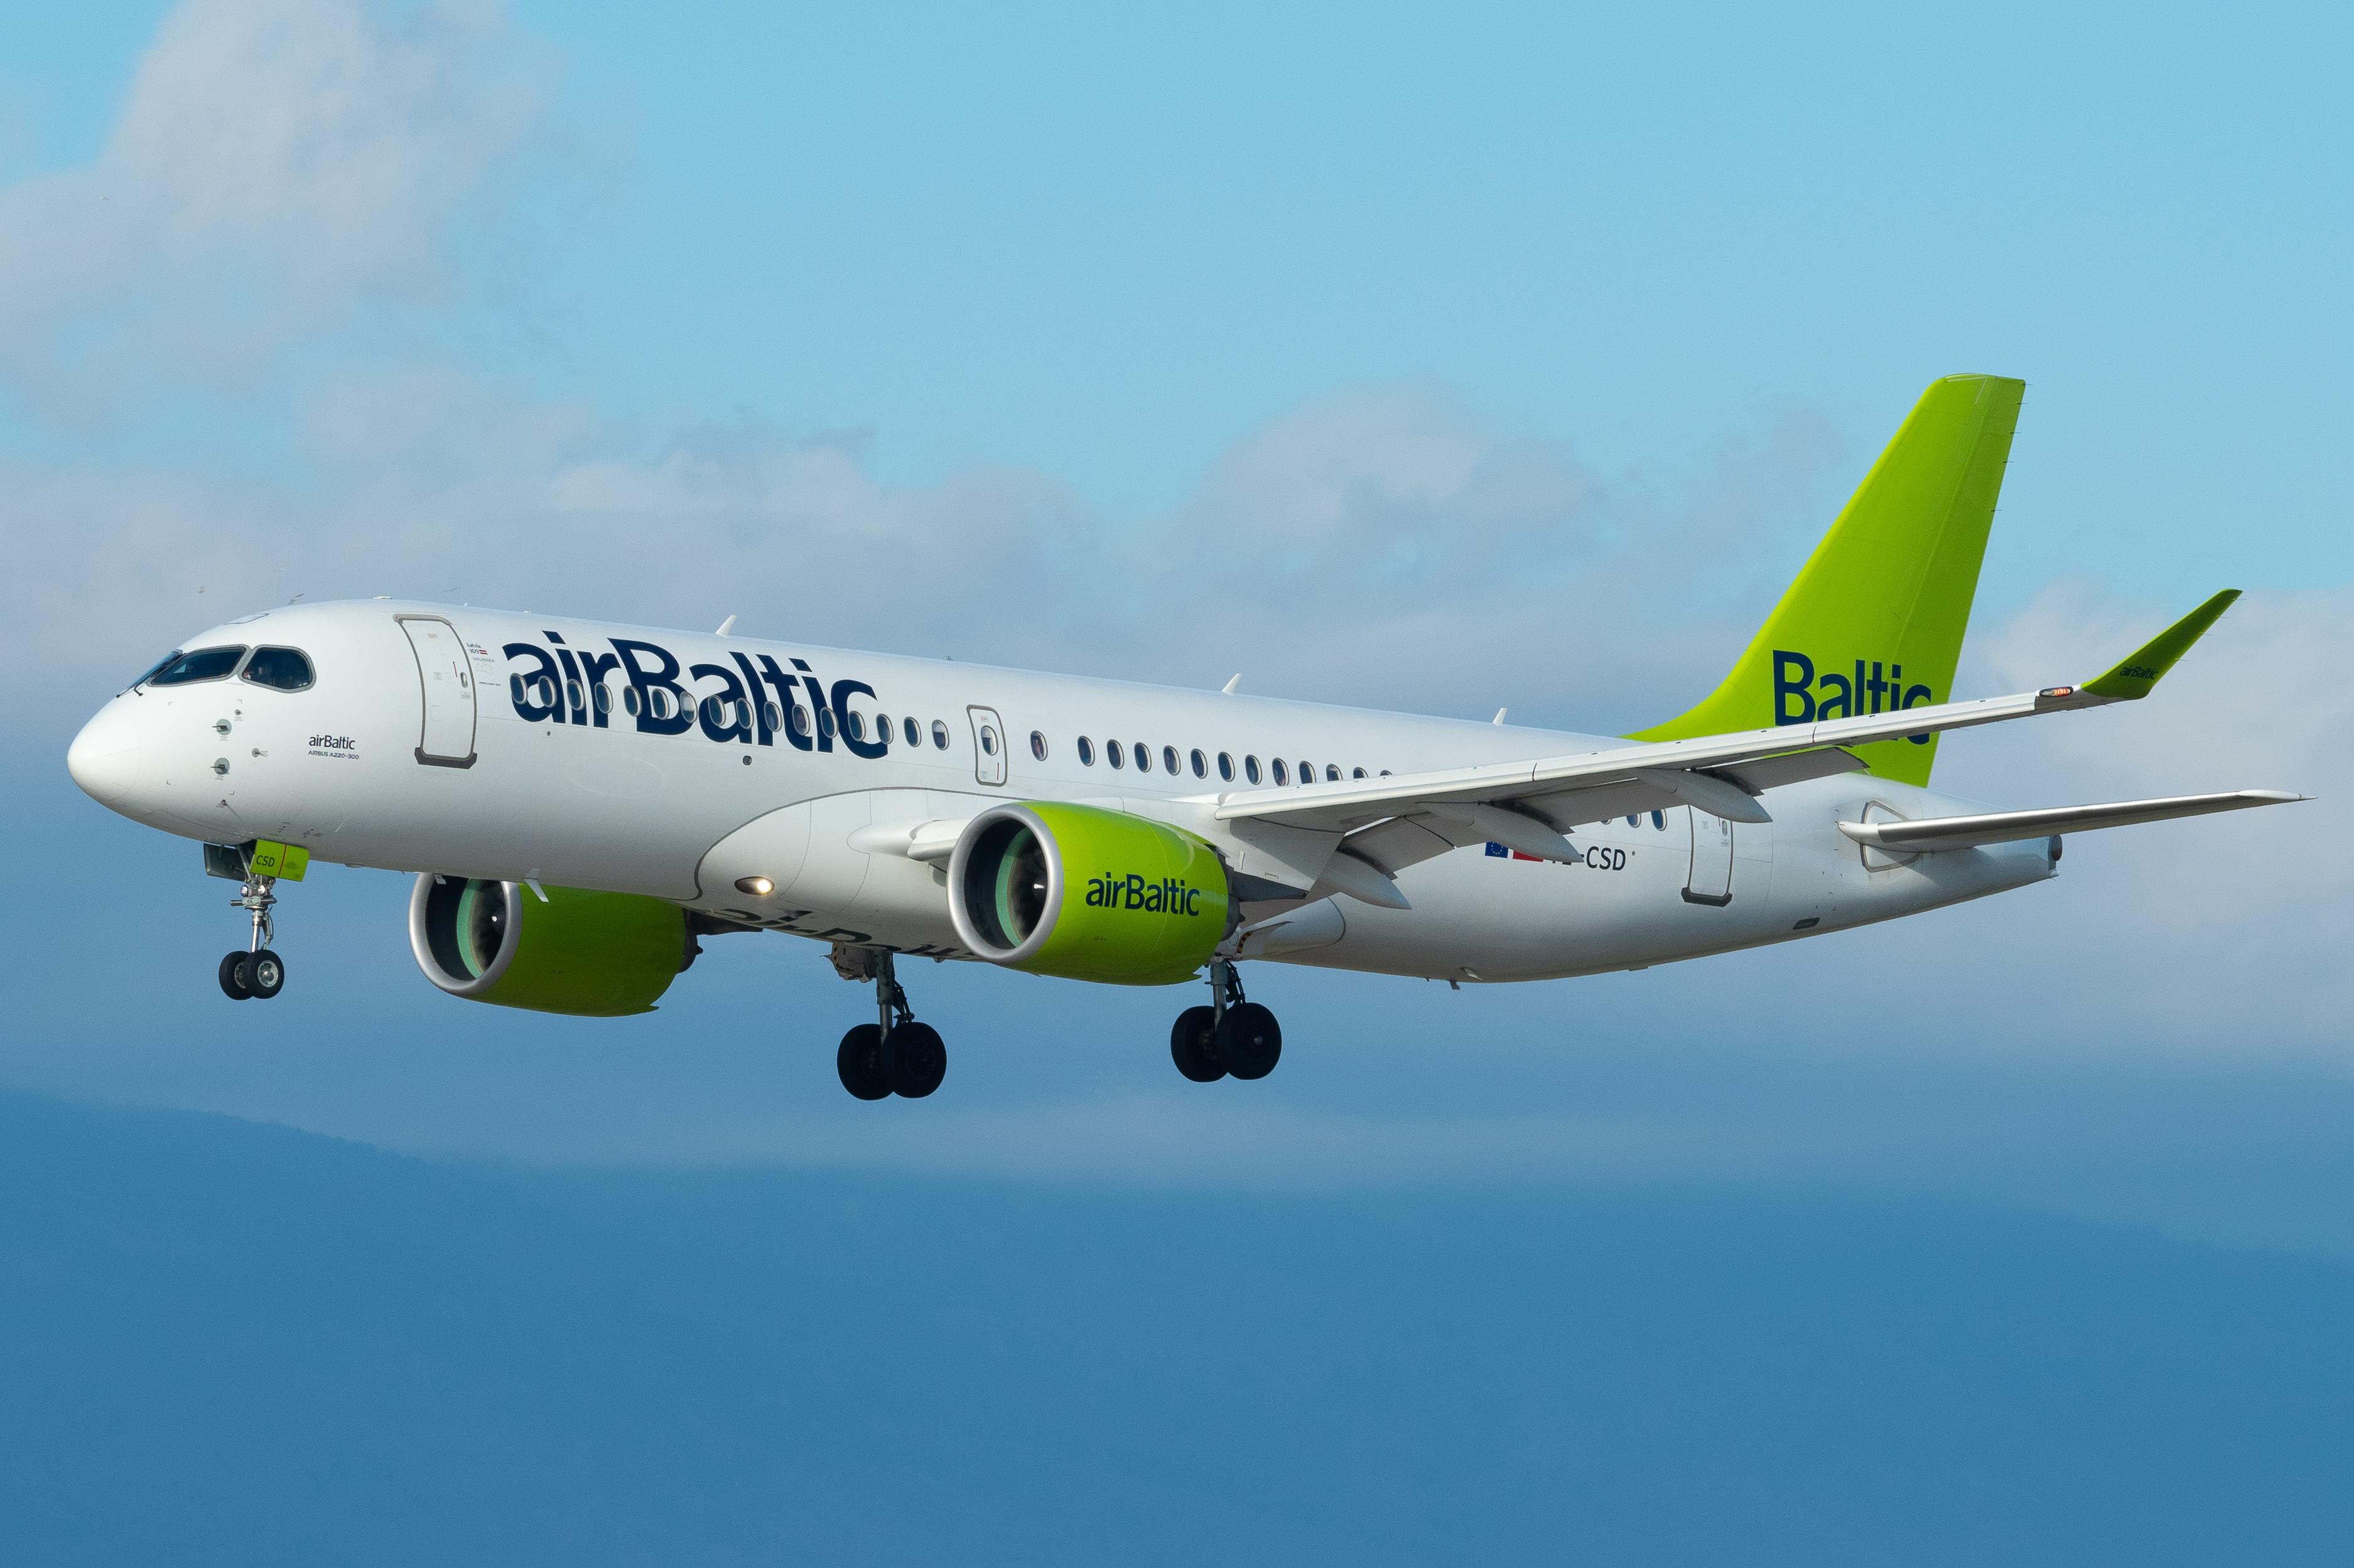 bd3dcf34ea24fc Airbus A220 - Wikipedia